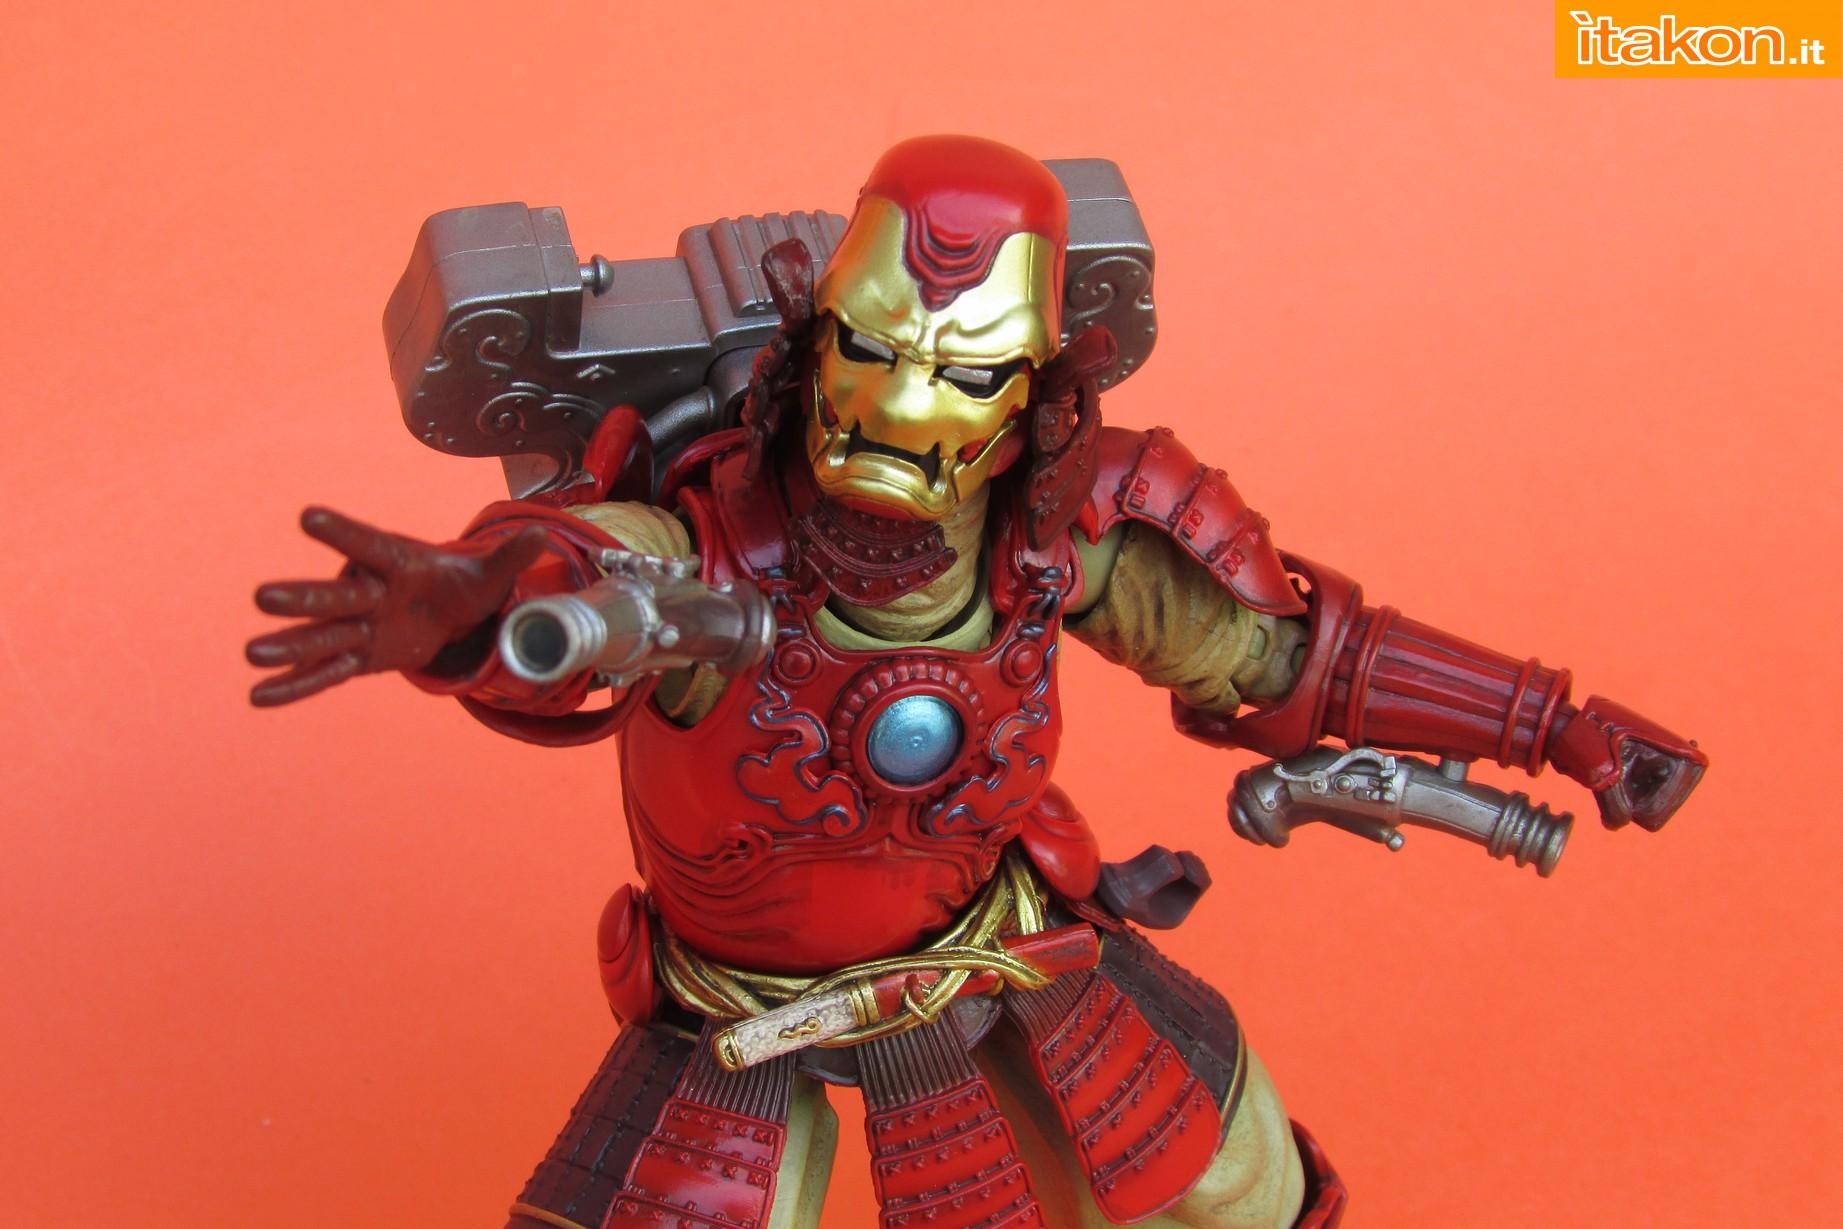 Link a Marvel Comics Koutetsu Samurai Iron Man Mark 3 Meishou MANGA REALIZATION review Bandai Itakon.it37